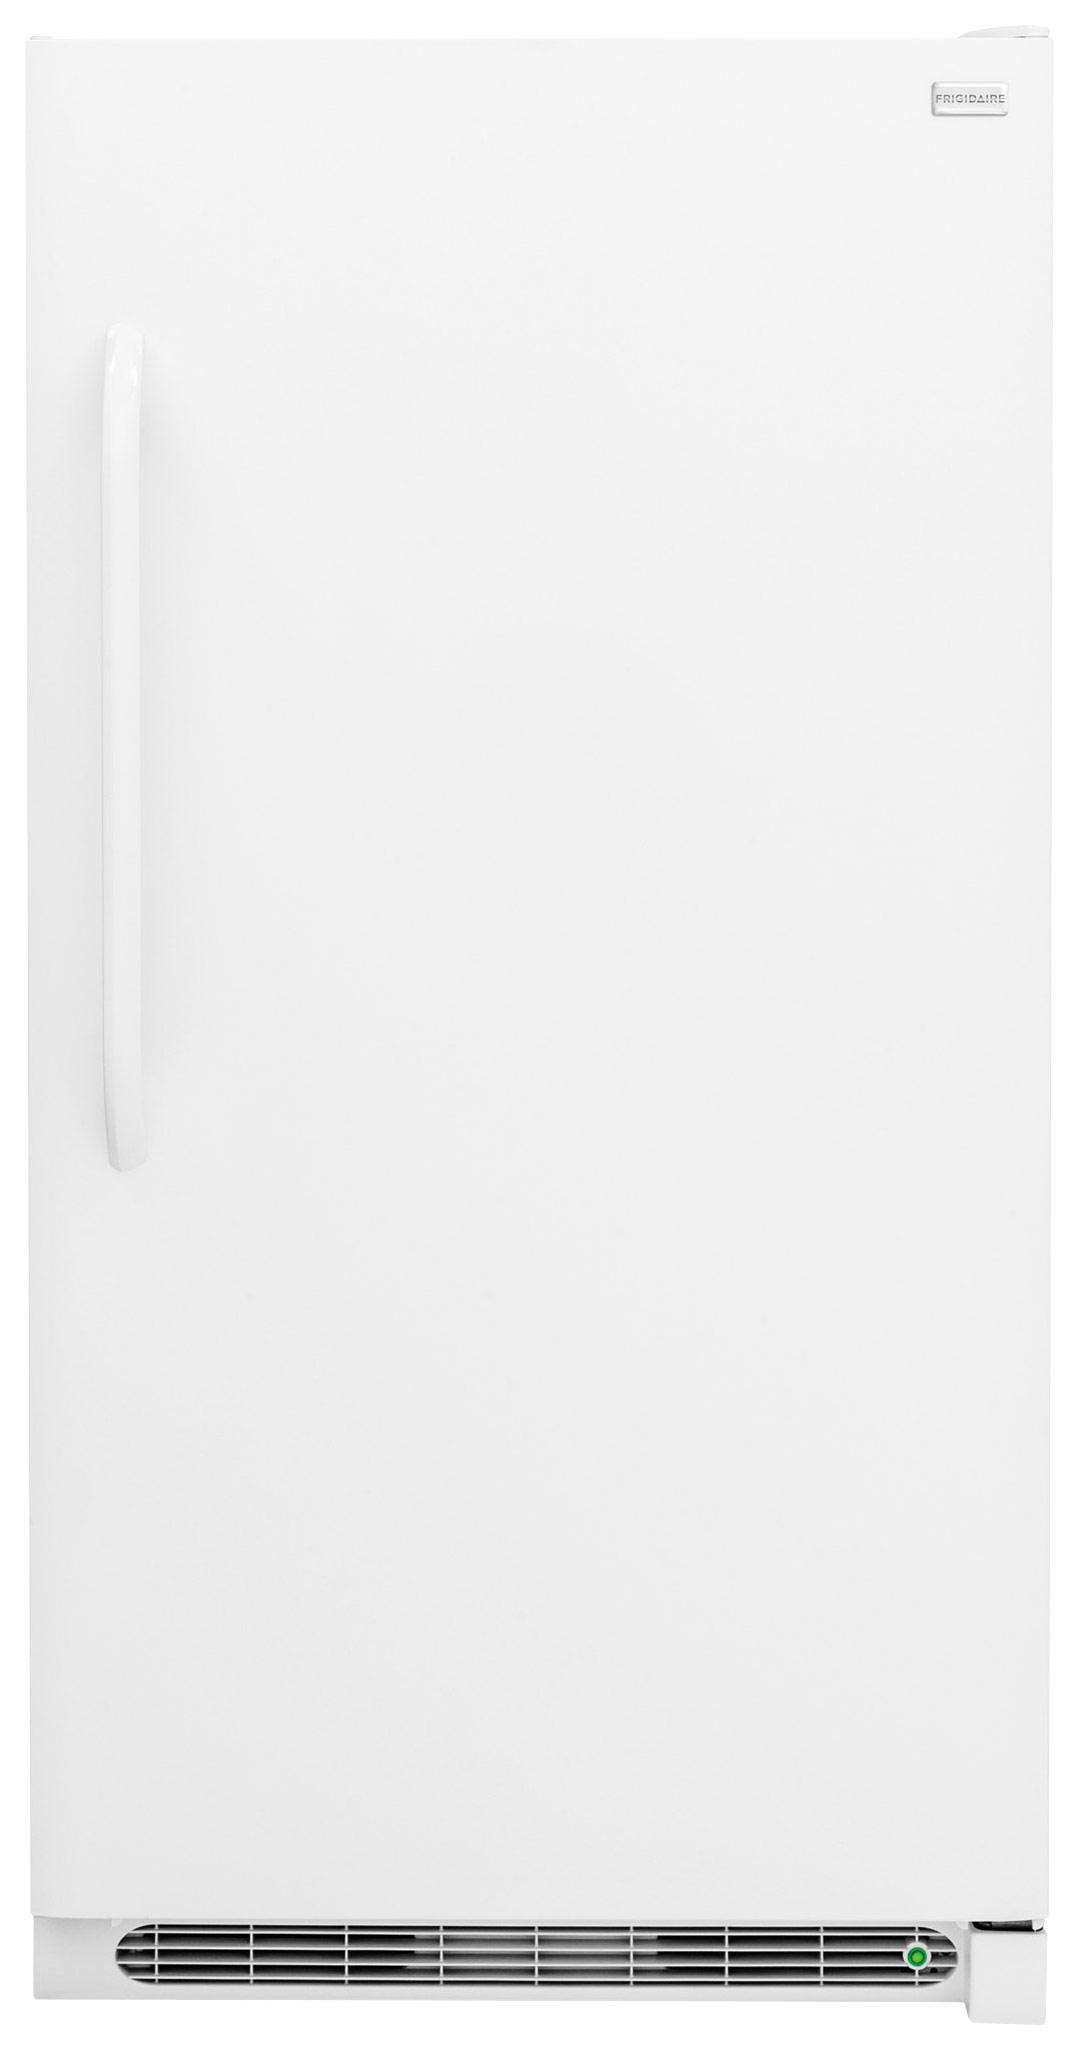 Frigidaire - 20.9 Cu. Ft. Upright Freezer - White